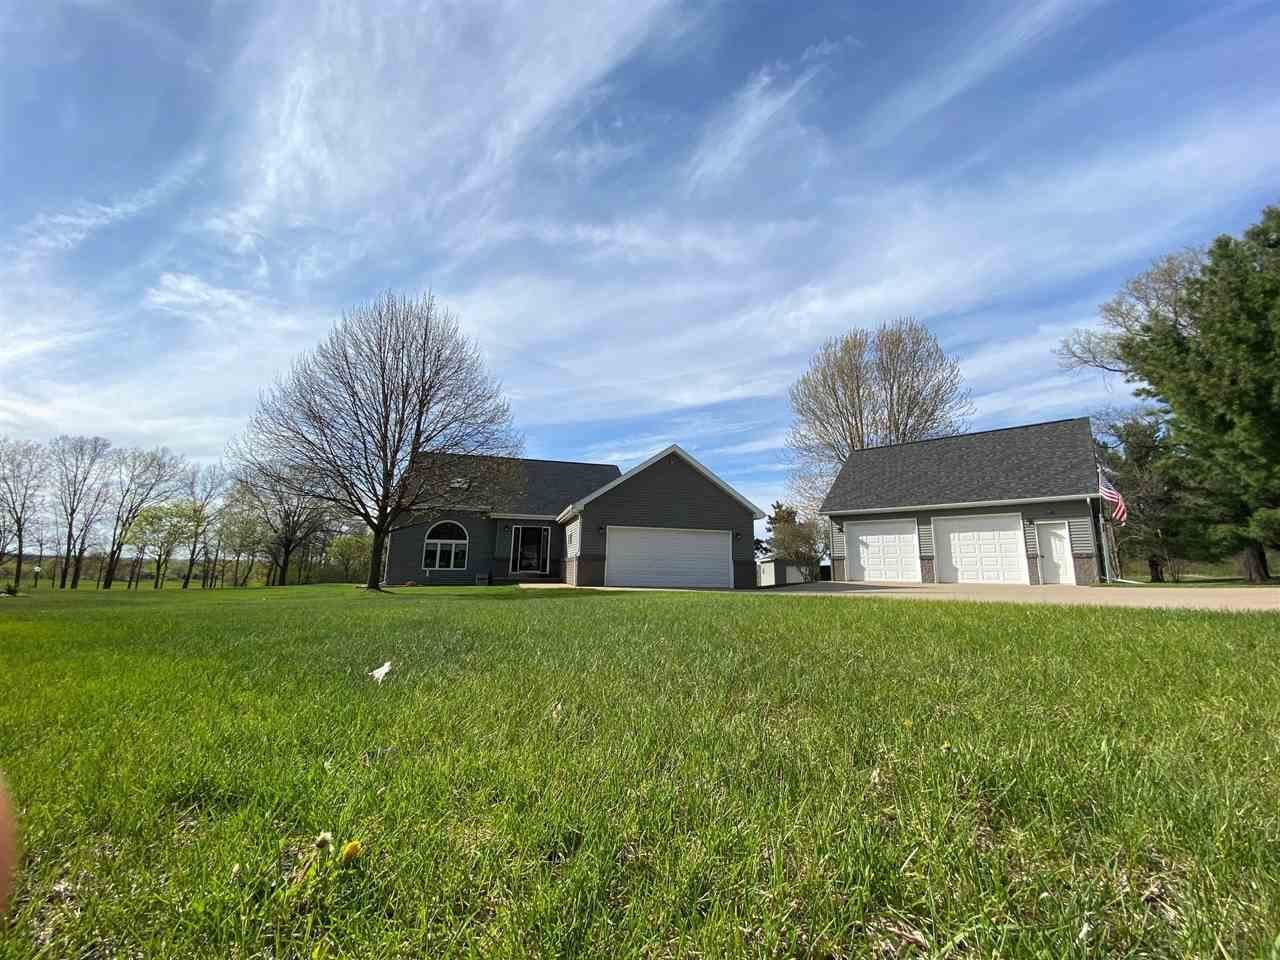 18505 idem rd sparta wi 54656 mls 1882853 listing information klapperich real estate klapperich real estate